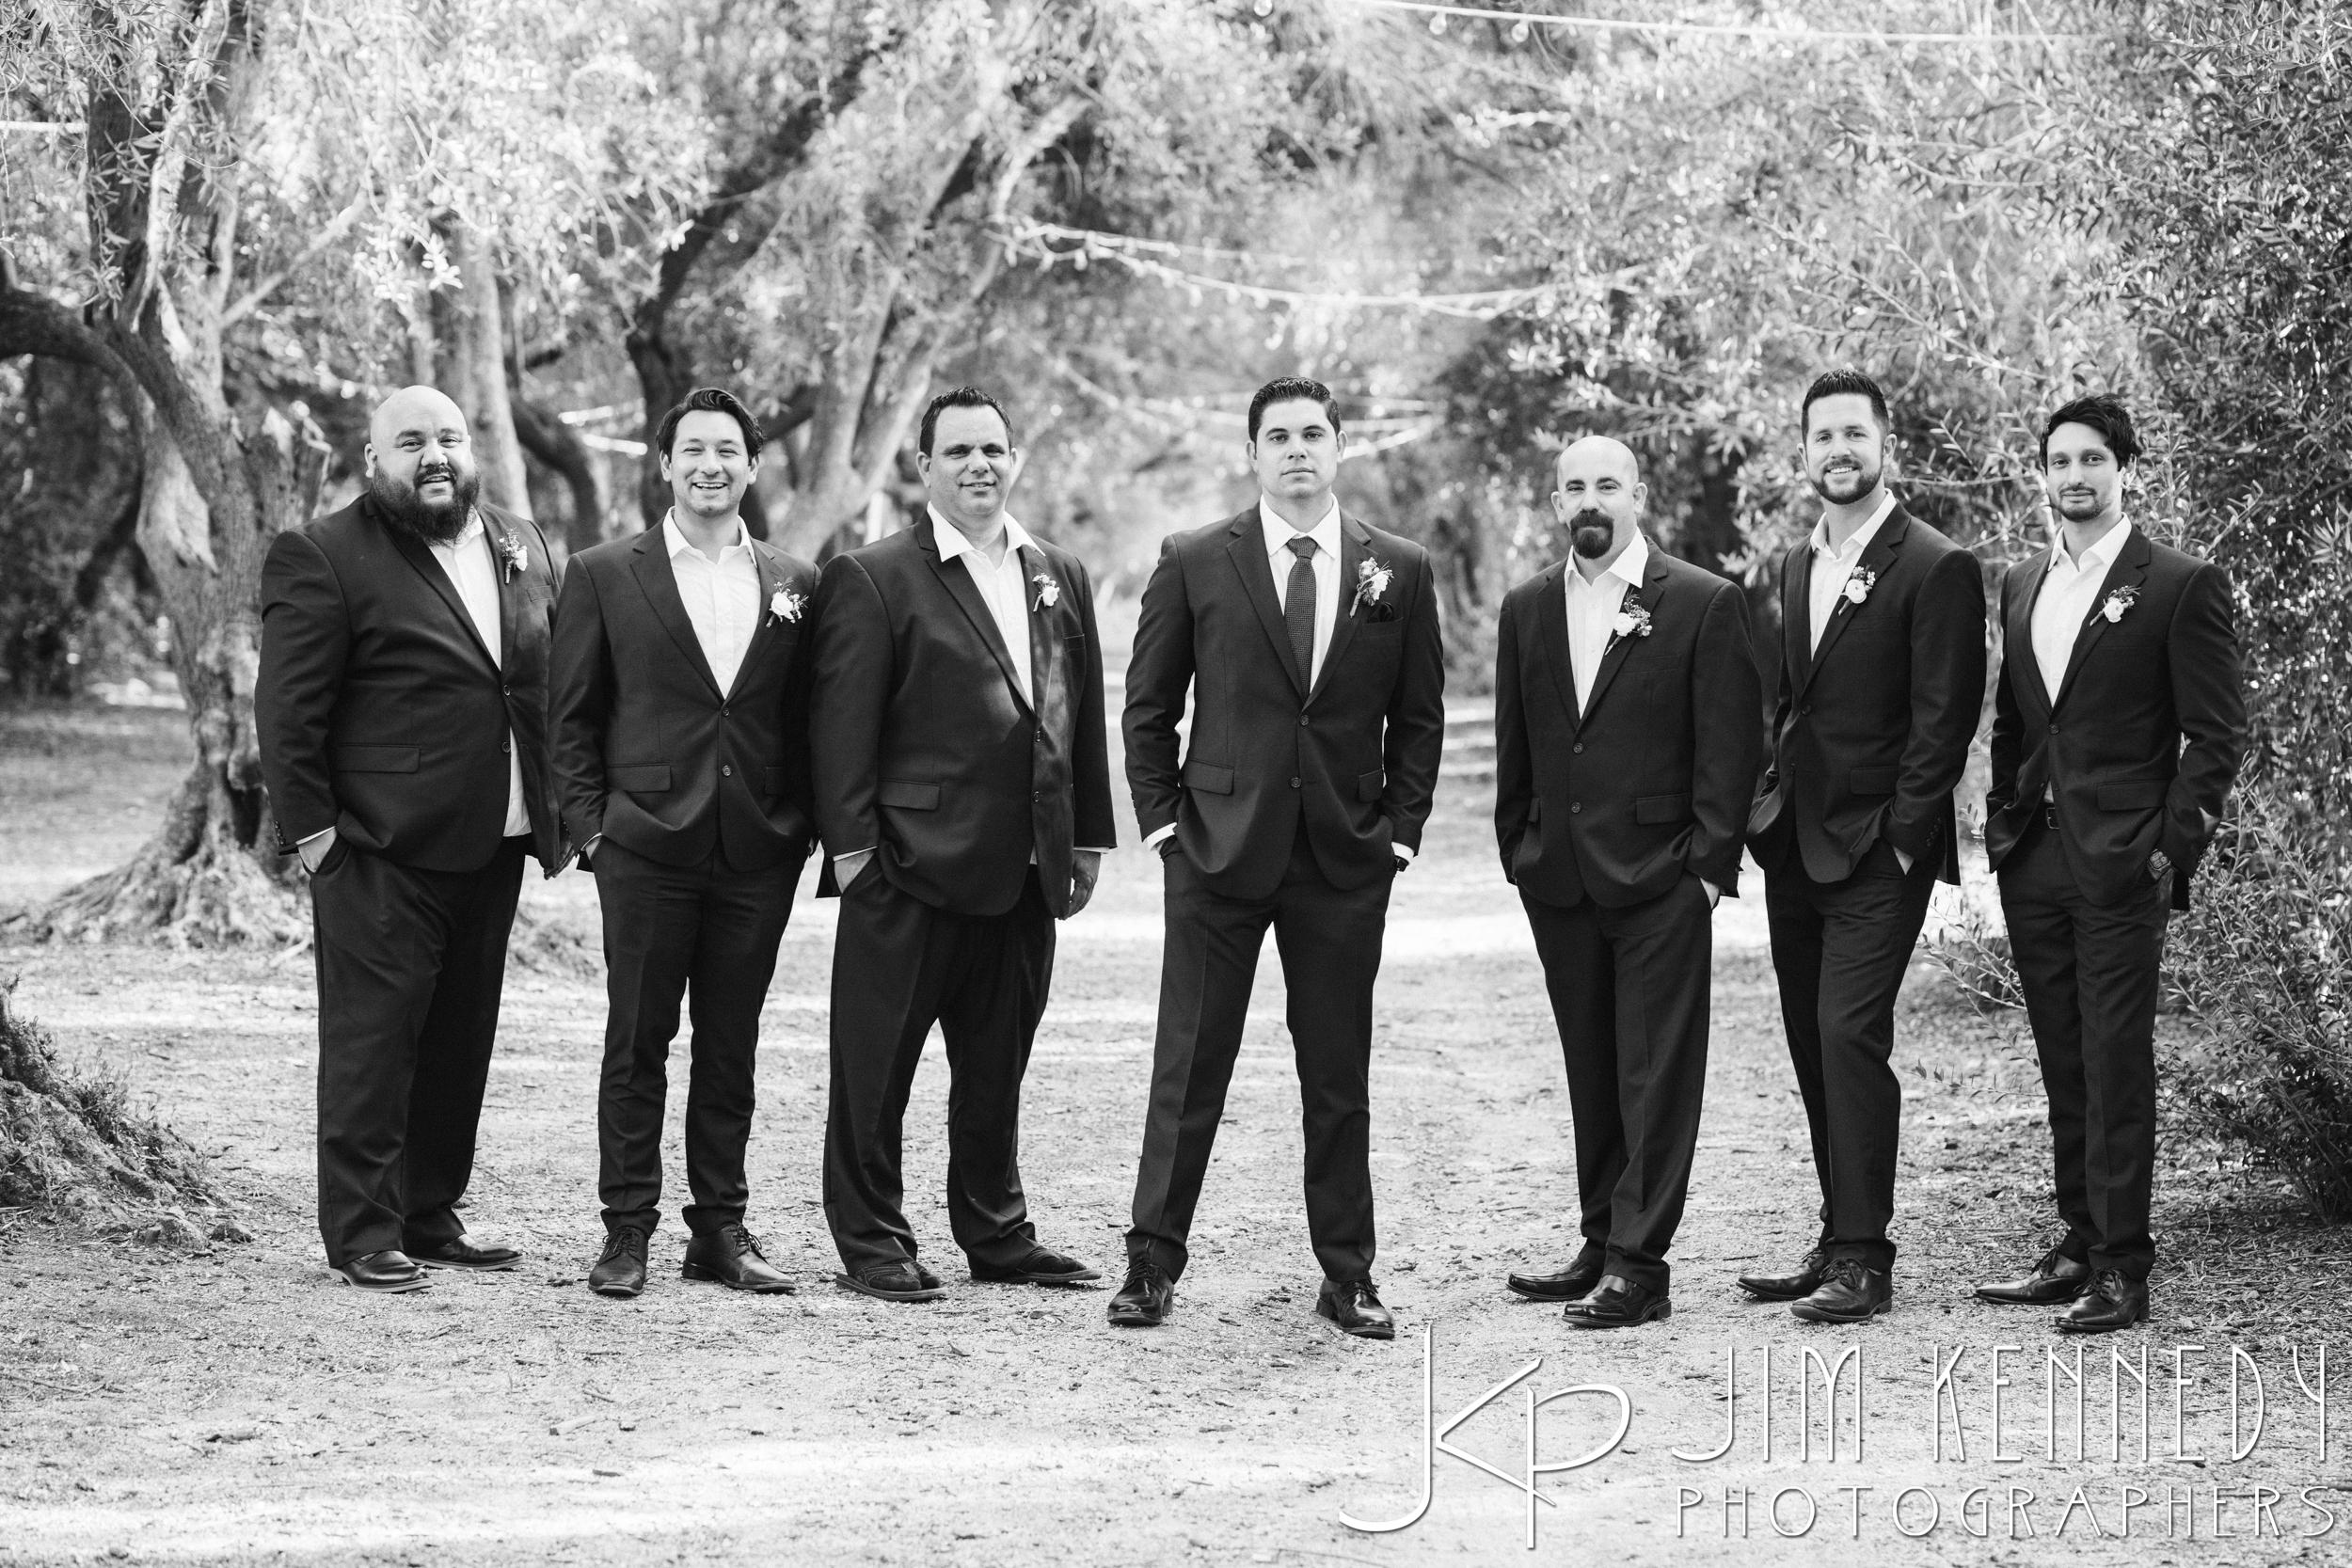 jim_kennedy_photographers_highland_springs_wedding_caitlyn_0088.jpg